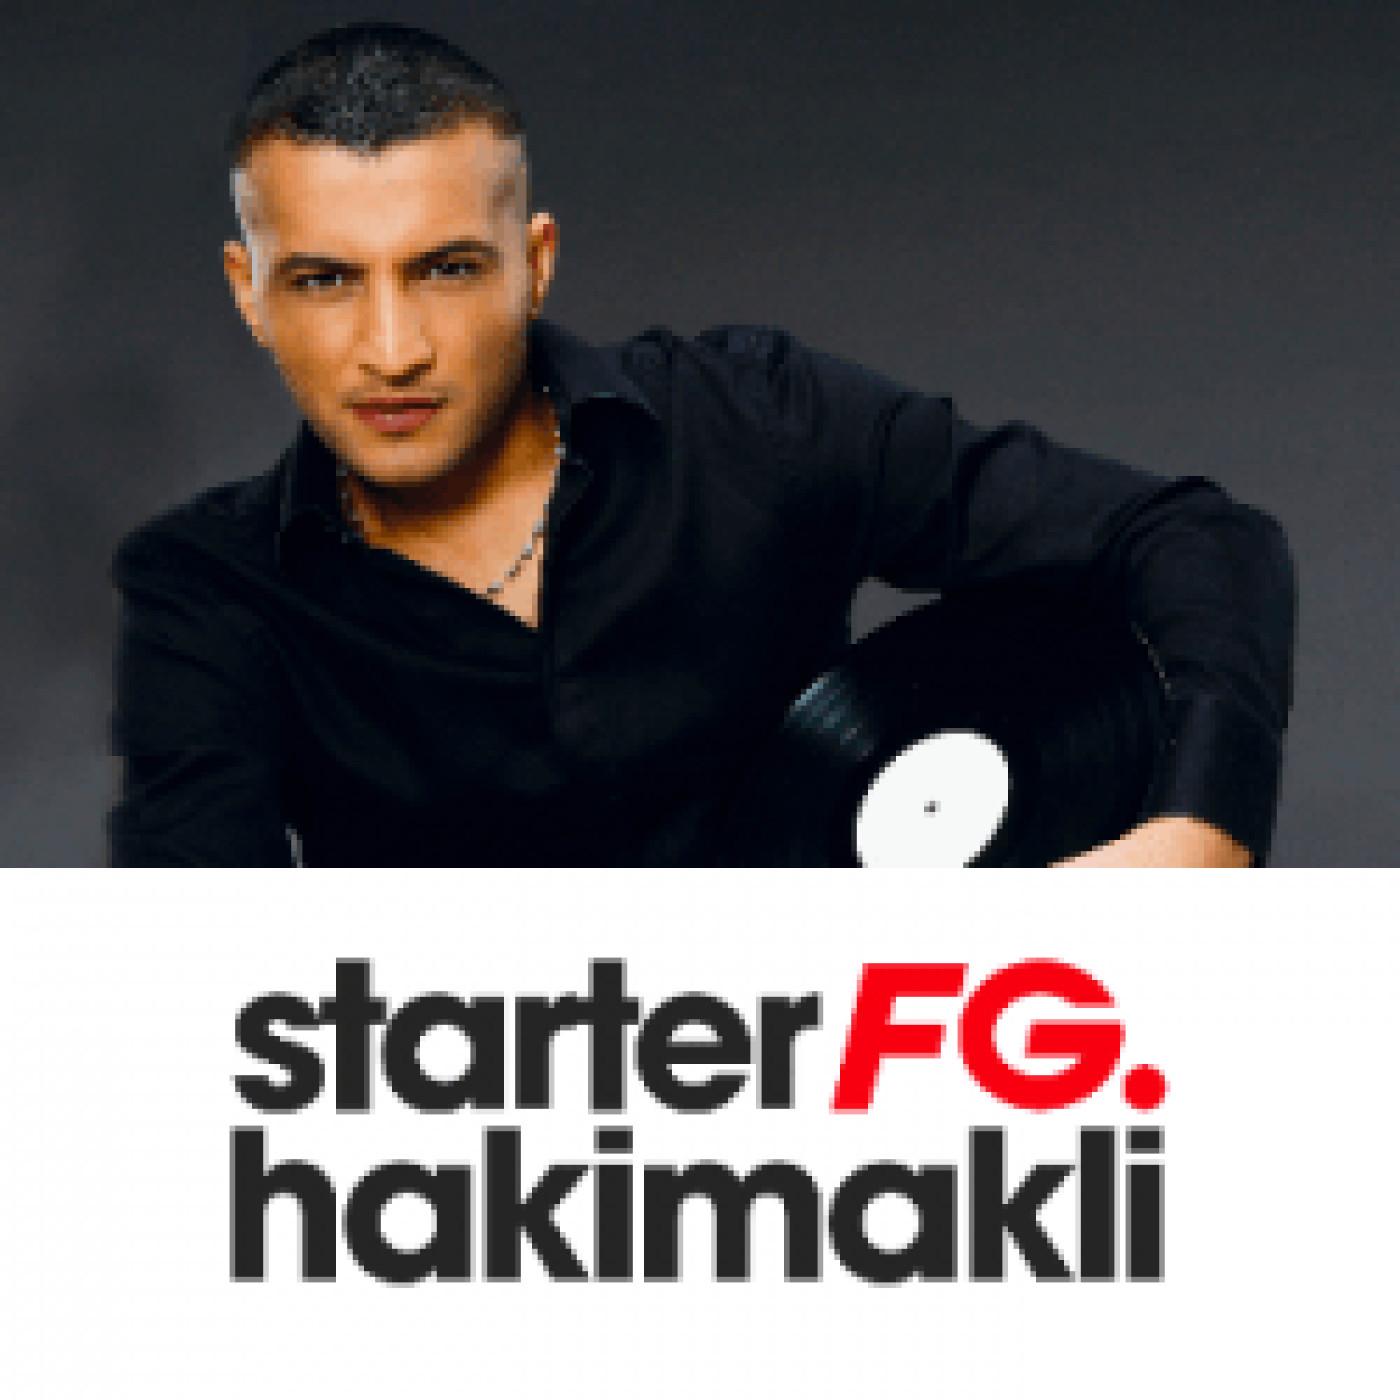 STARTER FG BY HAKIMAKLI MARDI 15 DECEMBRE 2020